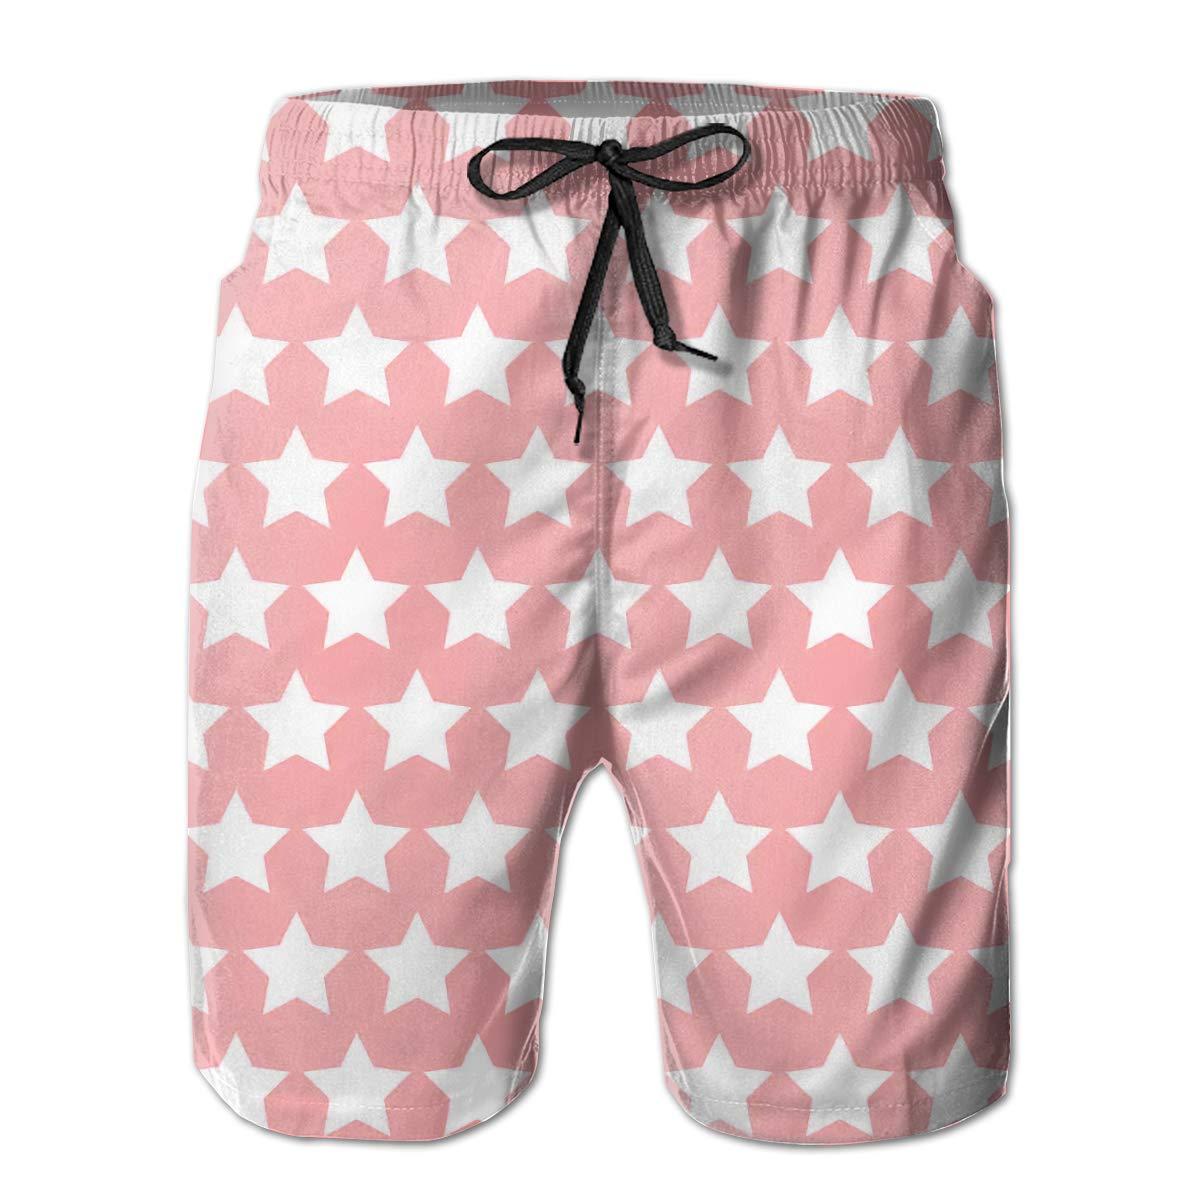 Men Comfortable Hawaii Beach Traveler Vintage Beach Shorts Swim Trunks Board Shorts